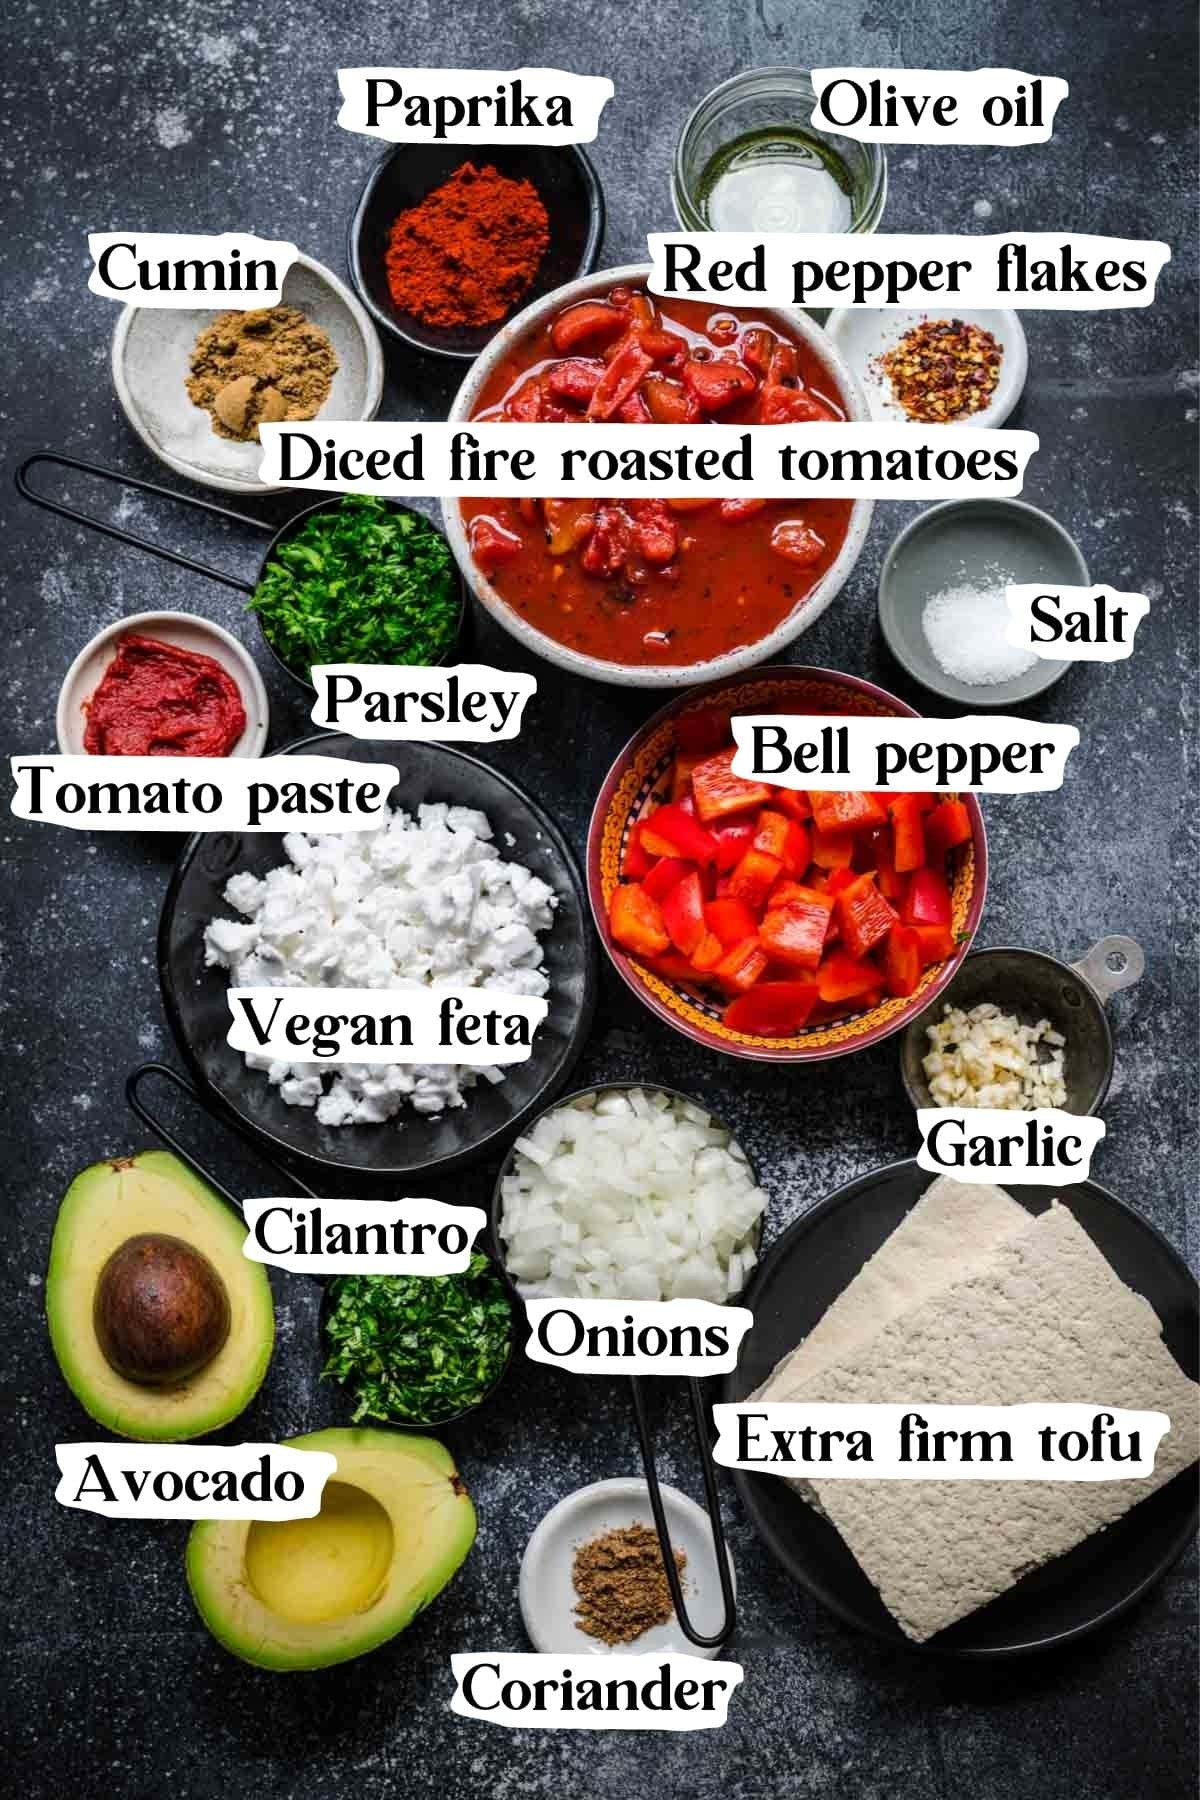 Overhead view of vegan shakshuka ingredients, including tofu, spices, avocado, and feta.